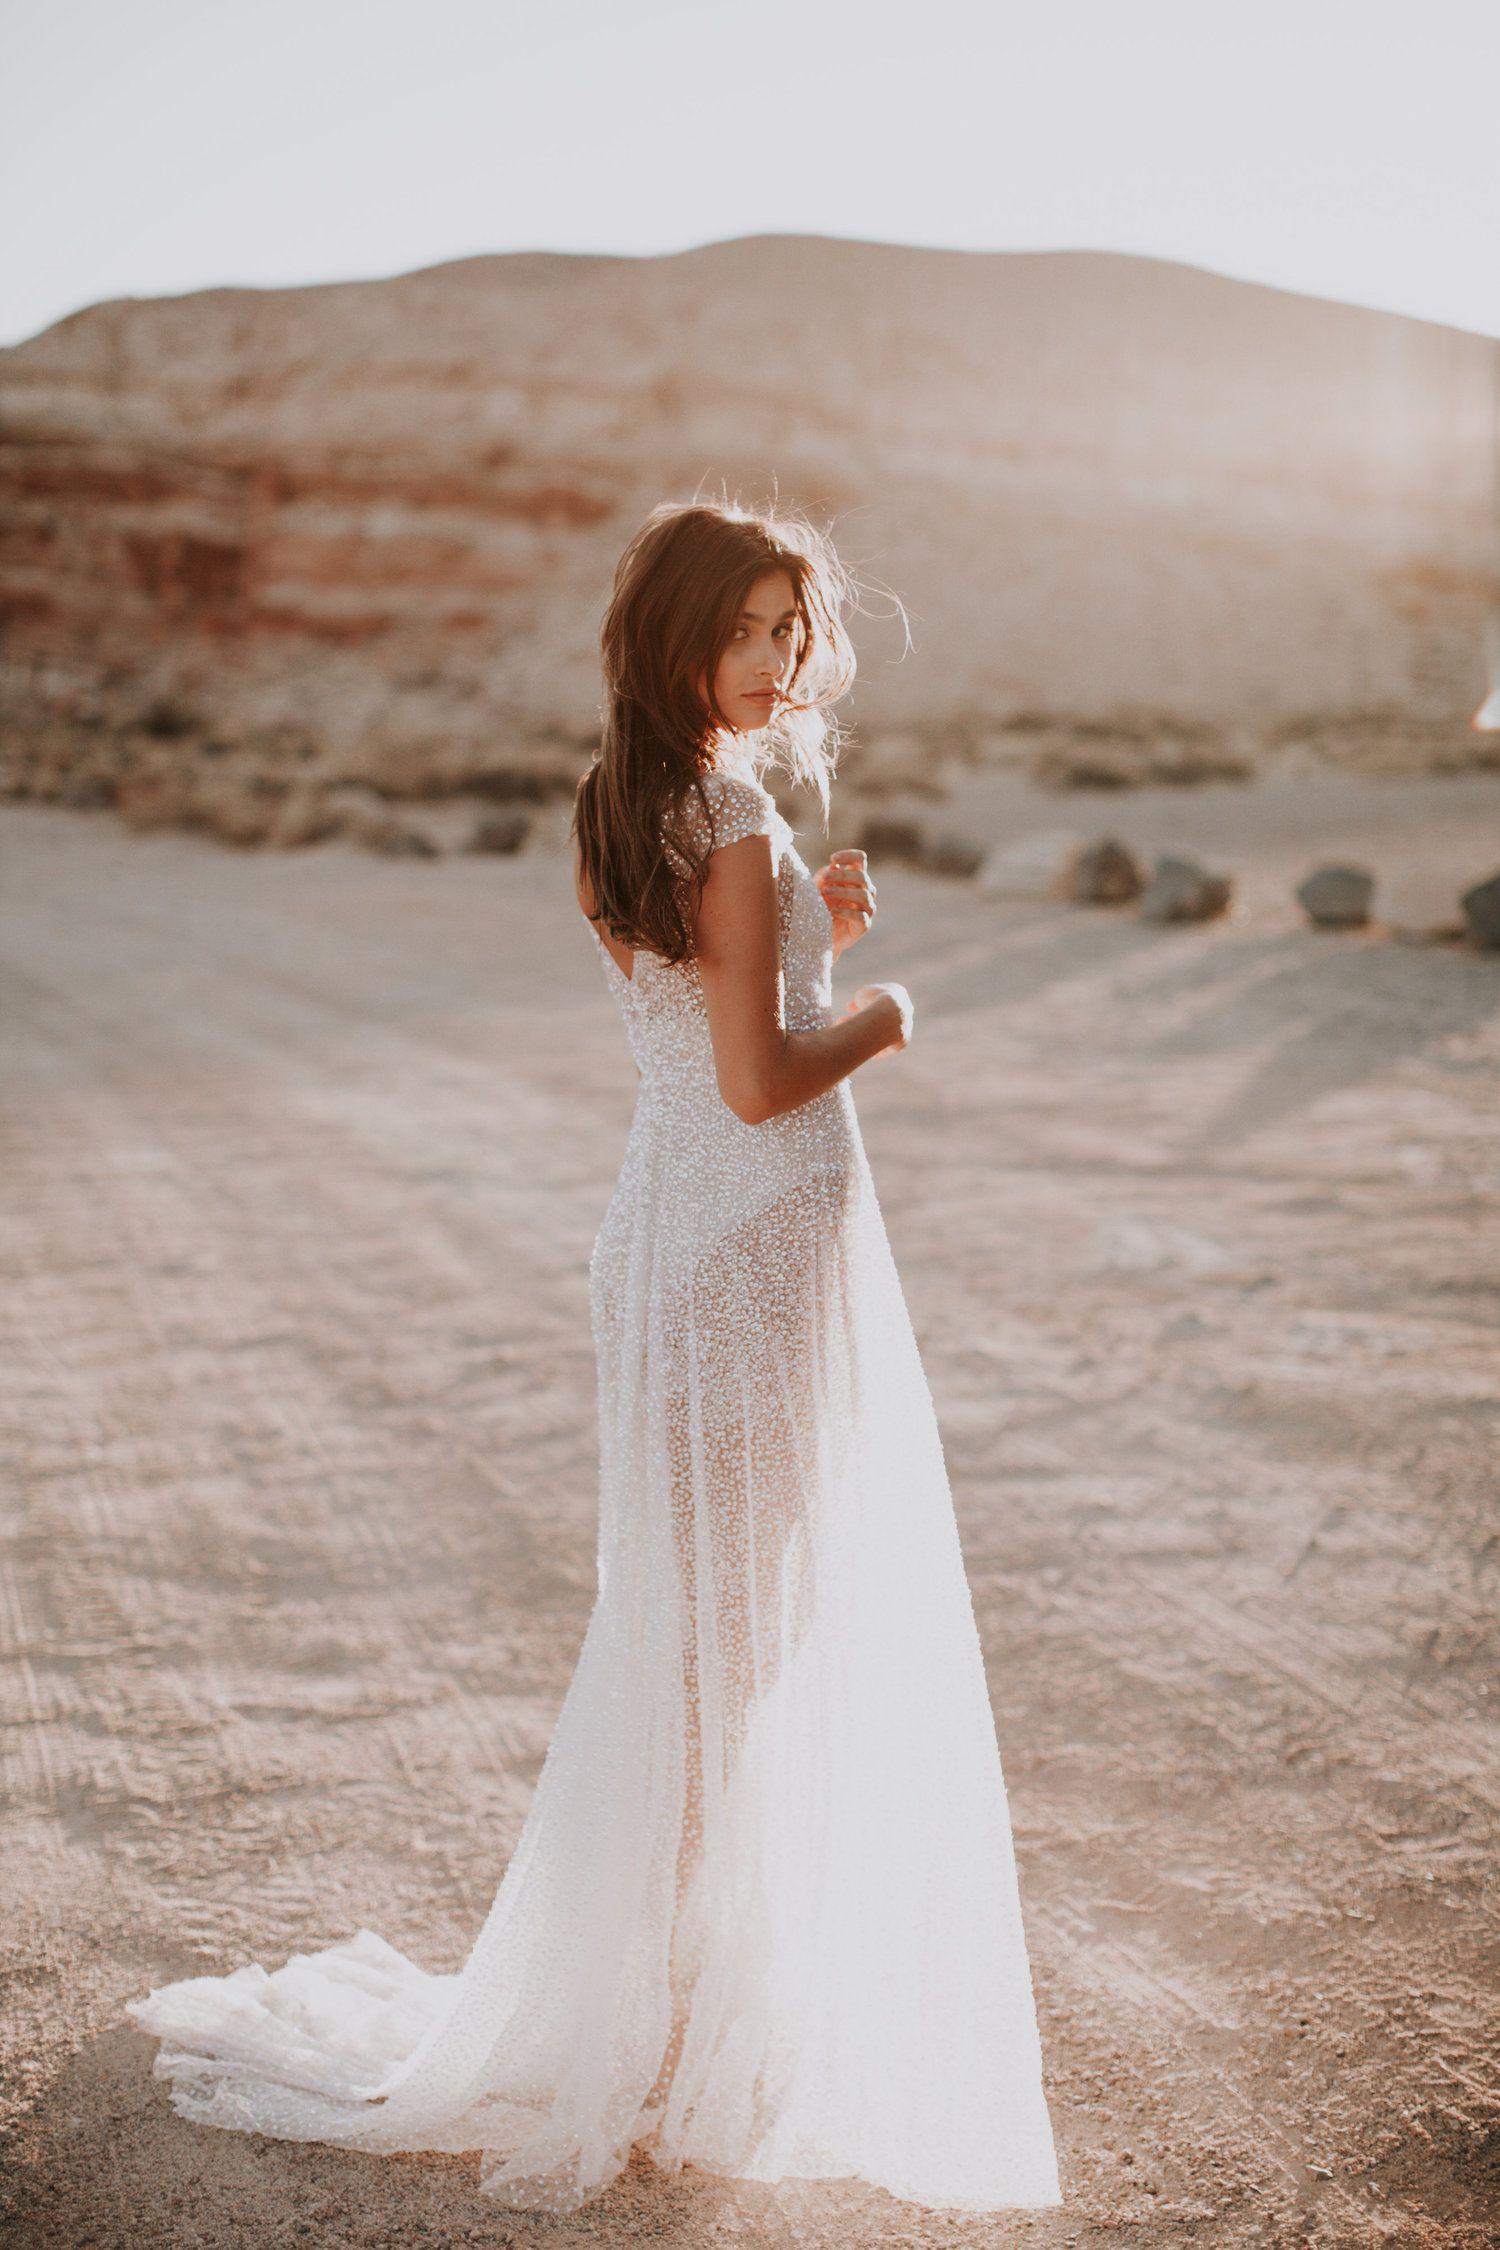 Anna Campbell Sydney Dress Vintage Inspired Hand Embellished Sequin Wedding Dress For Bohemian Wedding Dress Sequin Anna Campbell Bridal Custom Wedding Dress